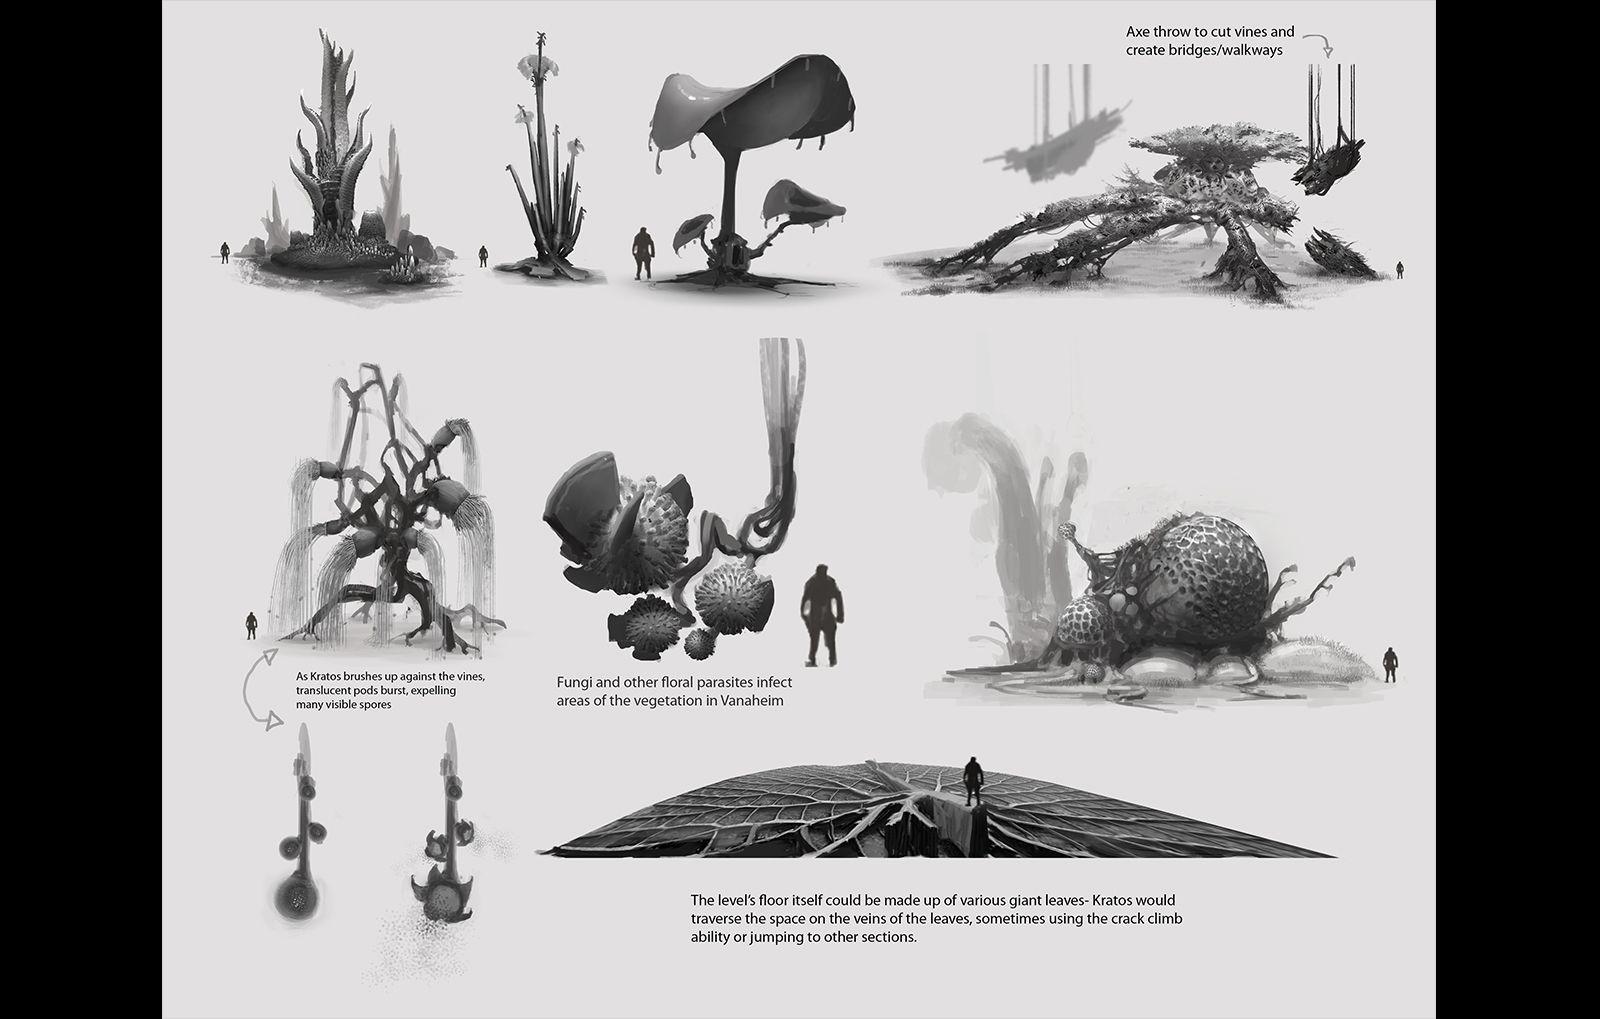 God-of-War-4-Setting-and-Concept-Leak-32.jpg (1600×1019)